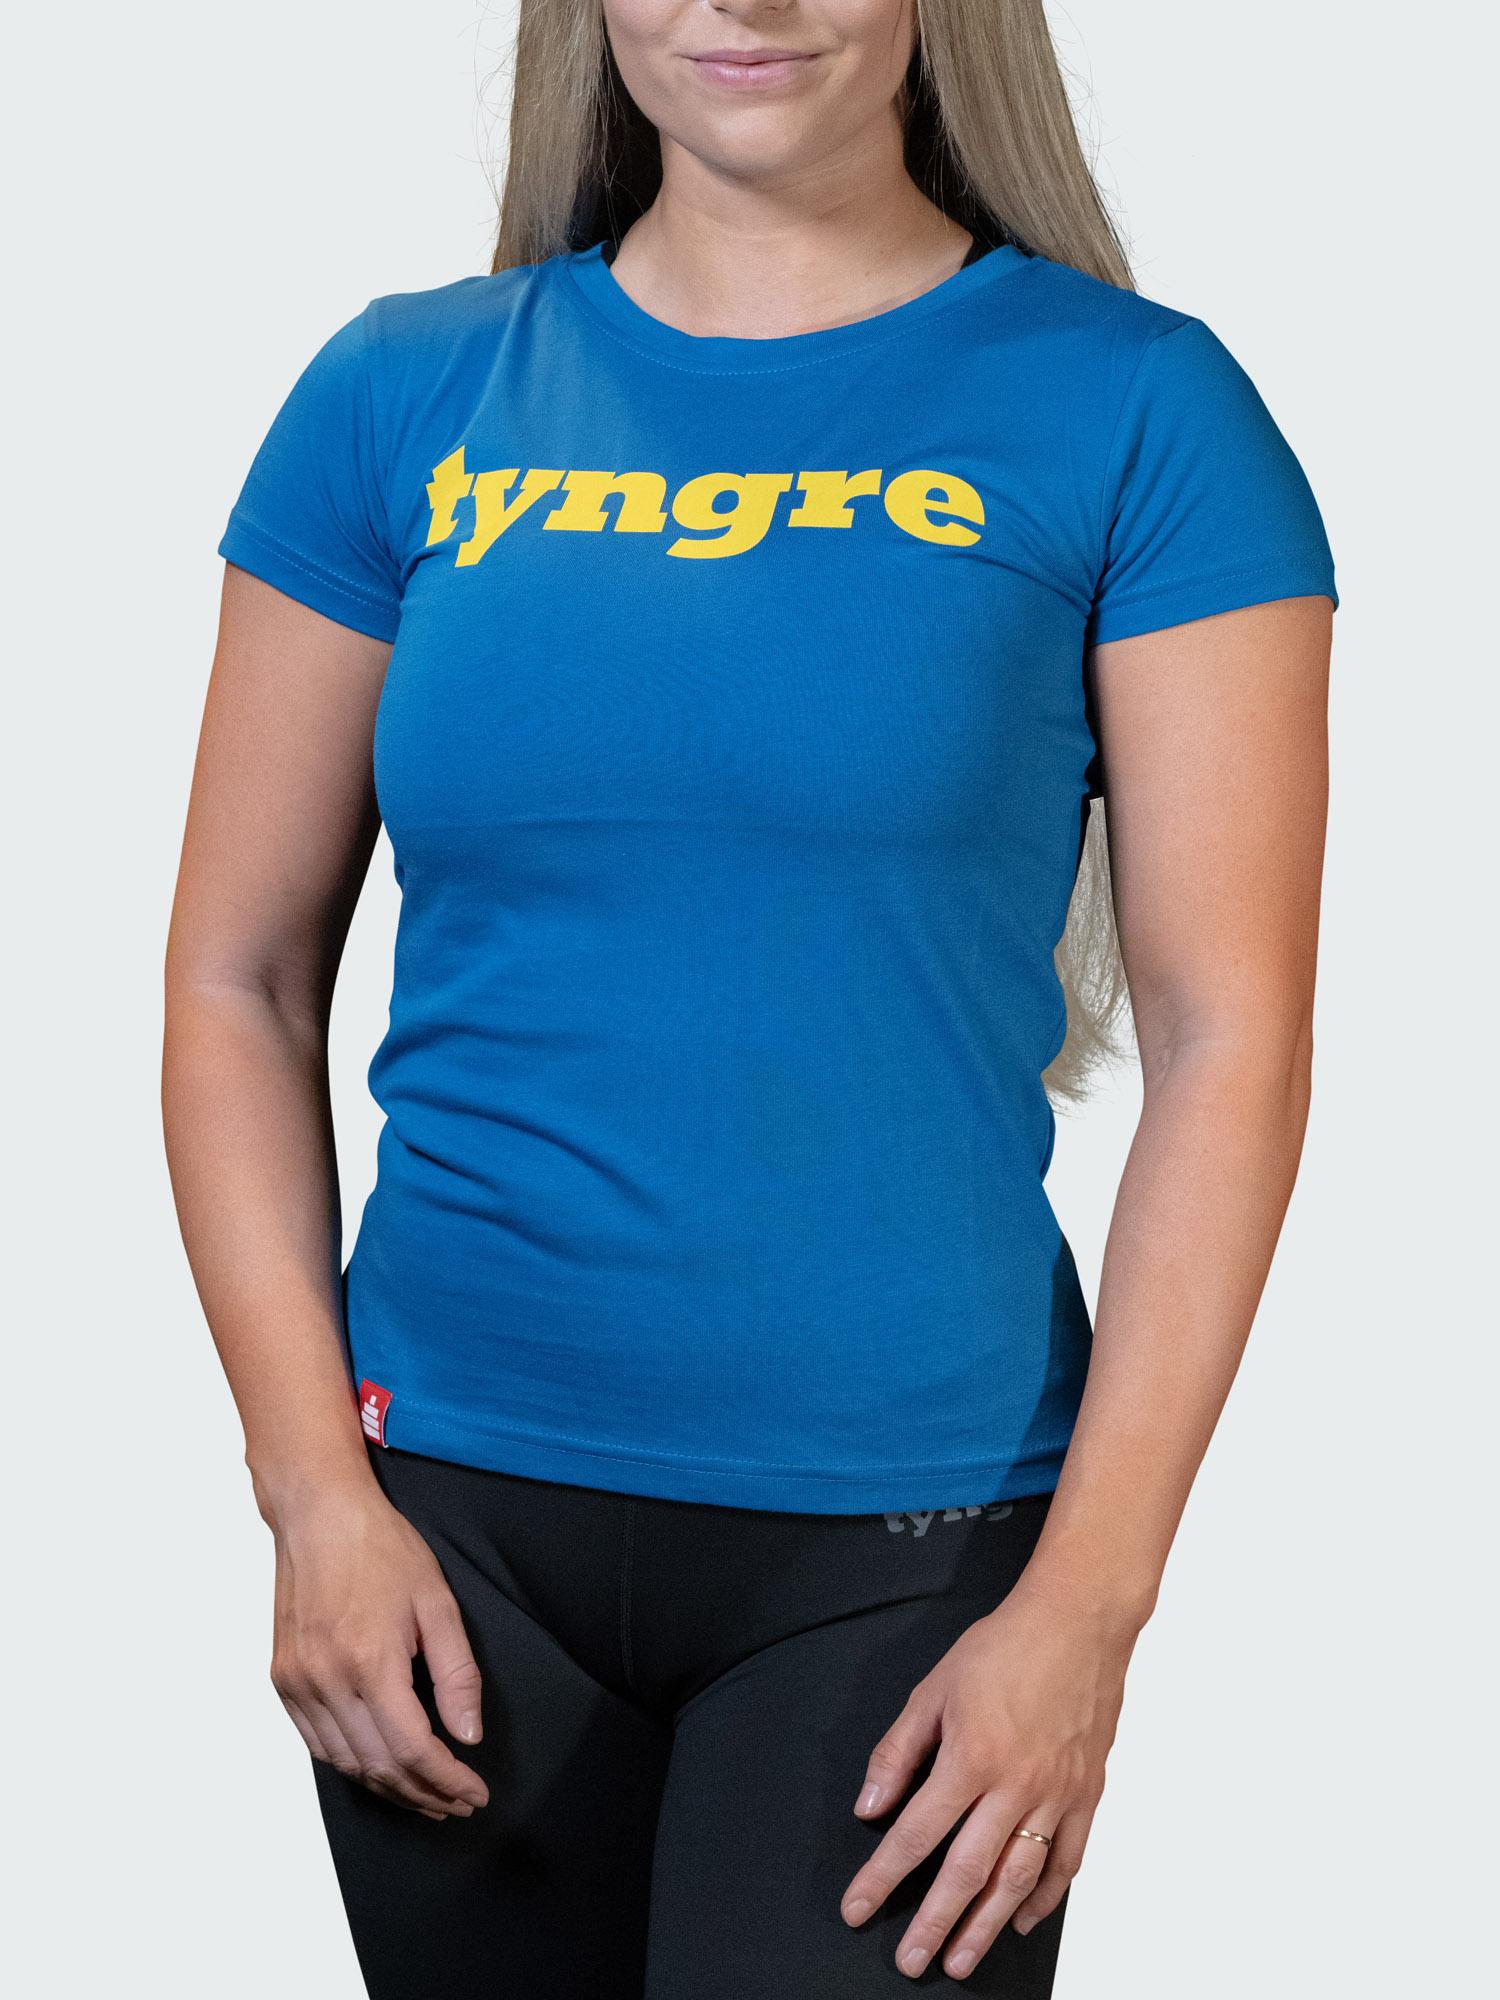 T-Shirt Logo Womens Blue Yellow